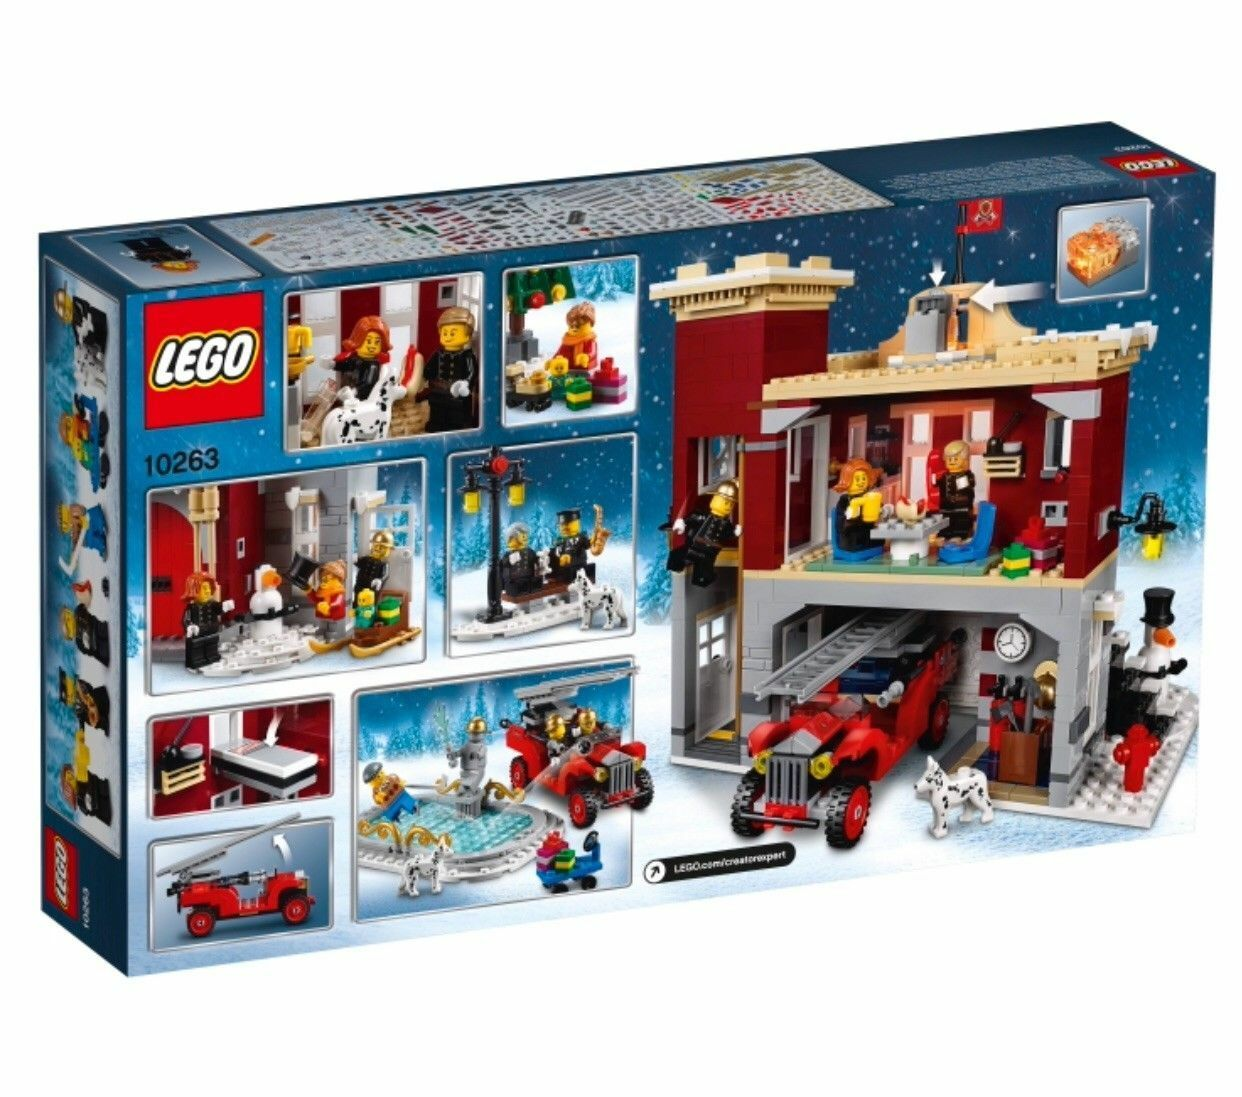 Lego 10263 Creator Expert Winter Village Fire Station NEW NEW NEW 5f5d88